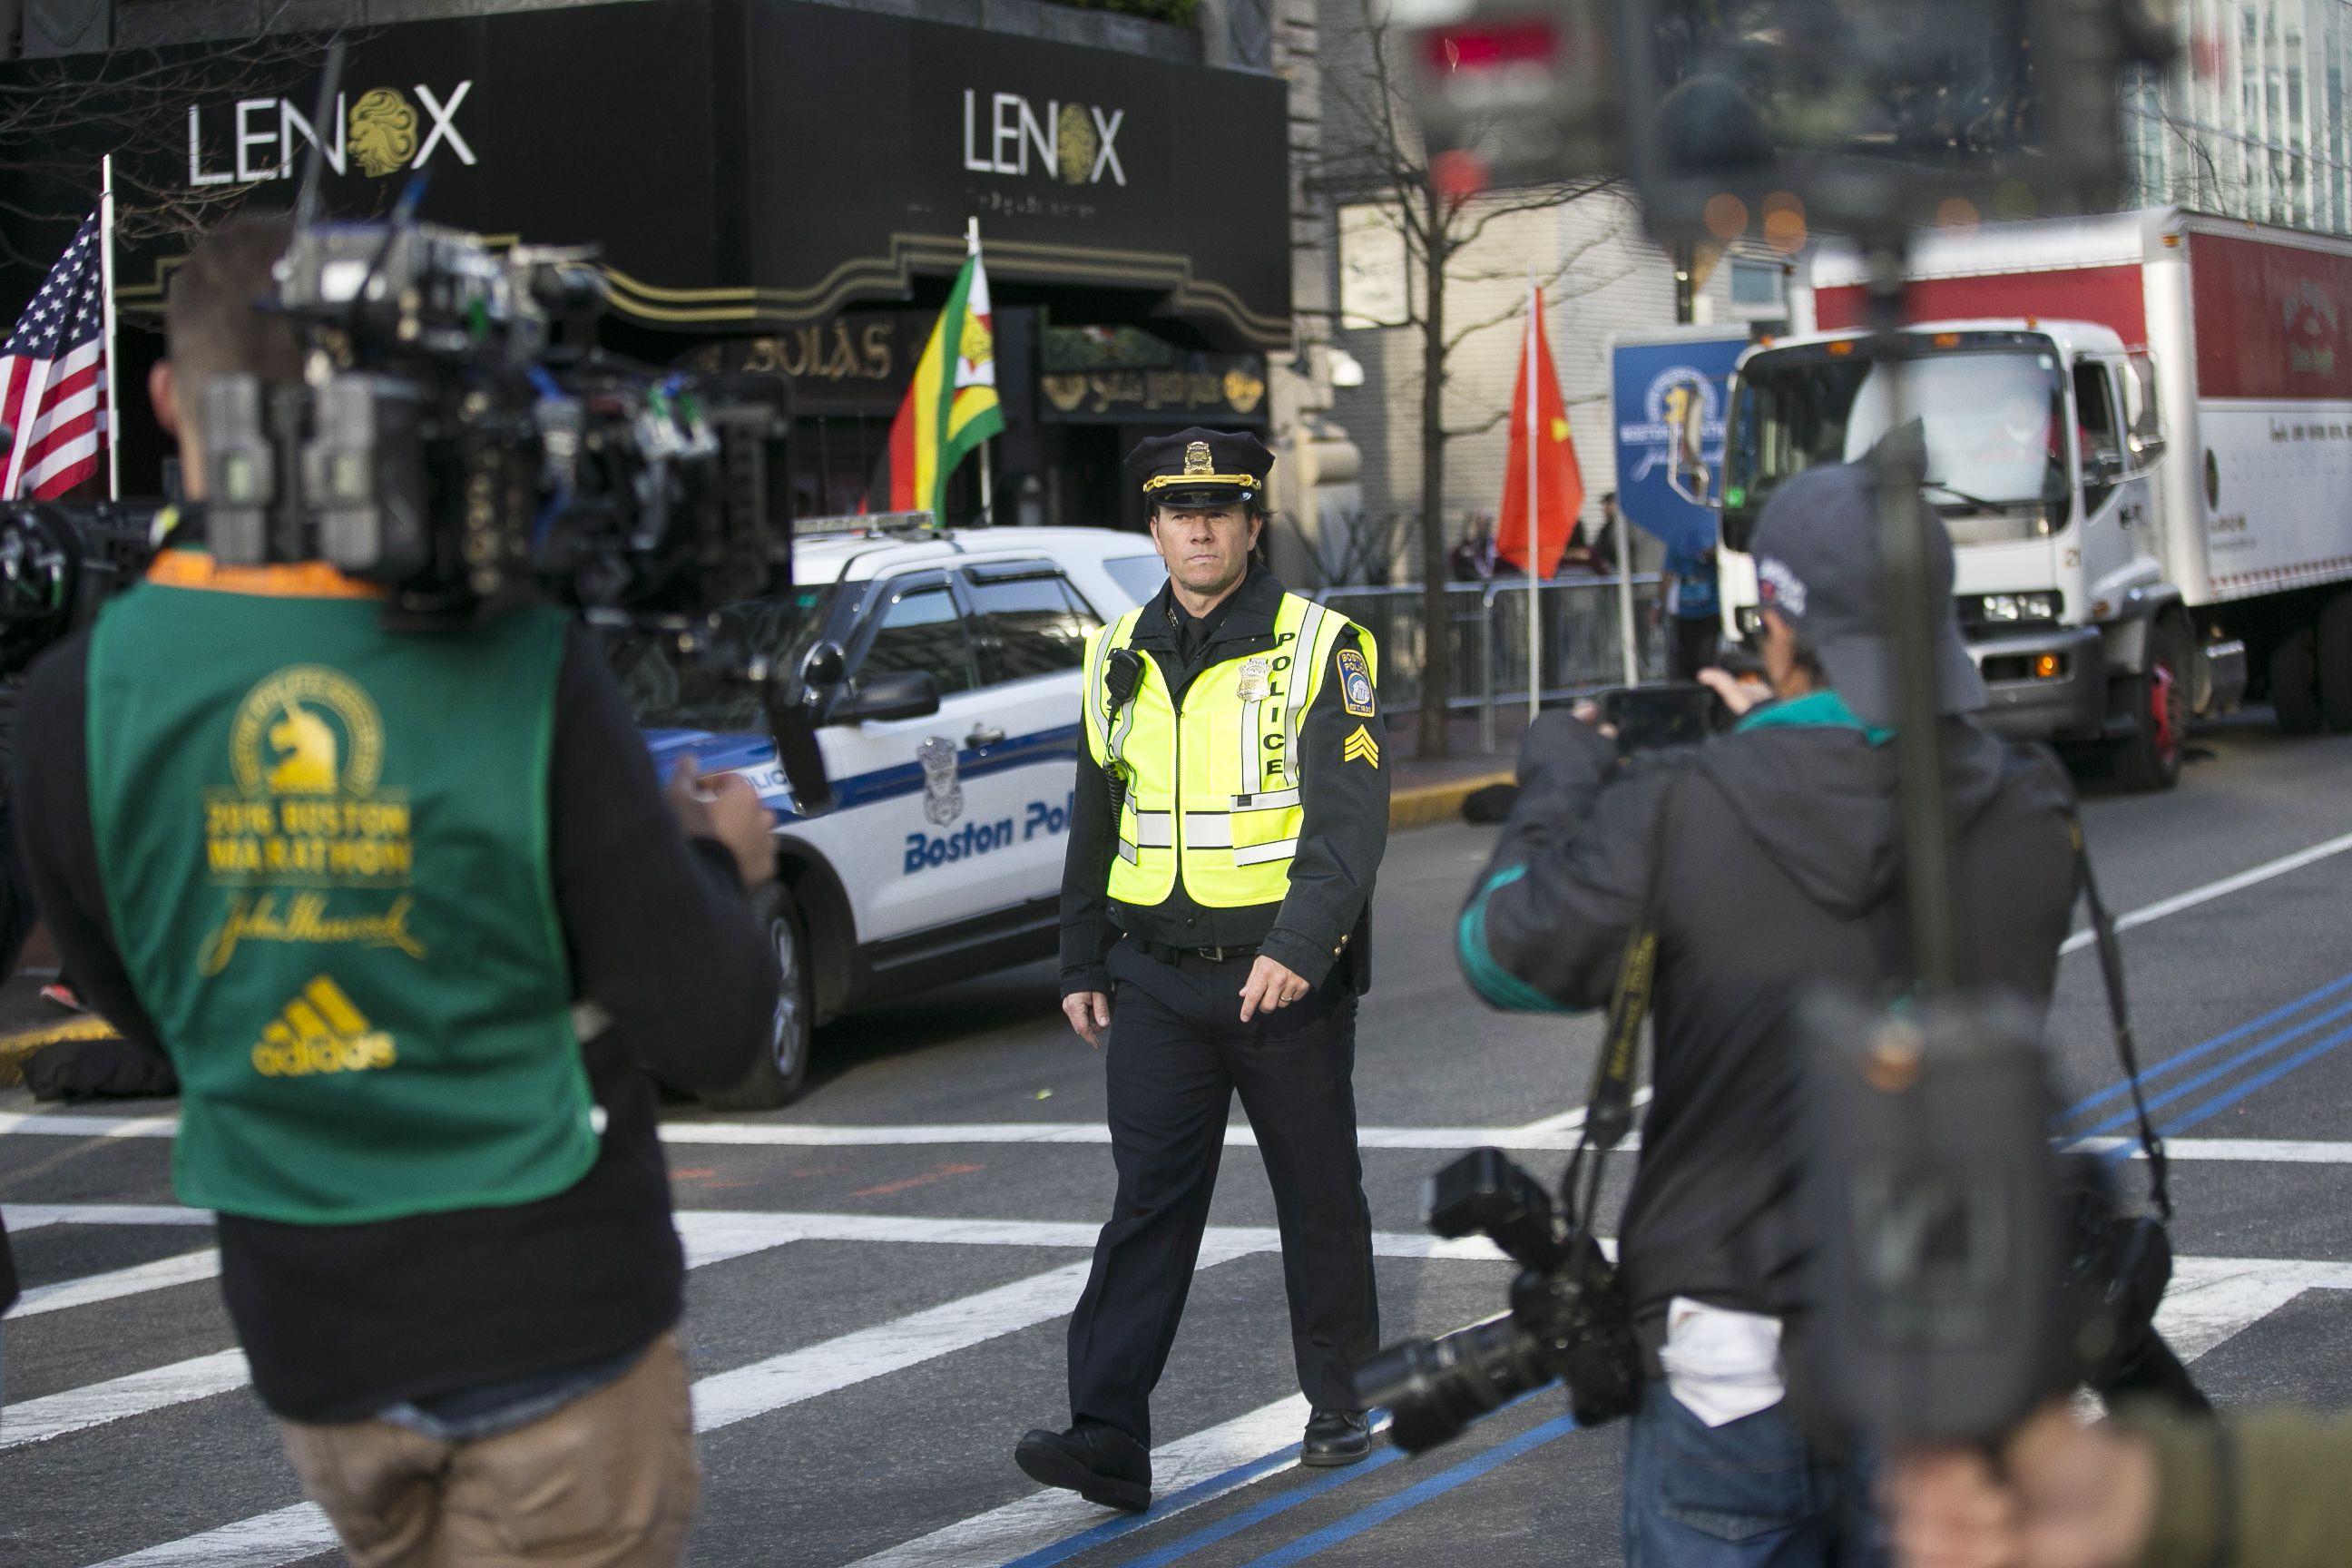 Fact-checking the 'Patriots Day' movie - The Boston Globe